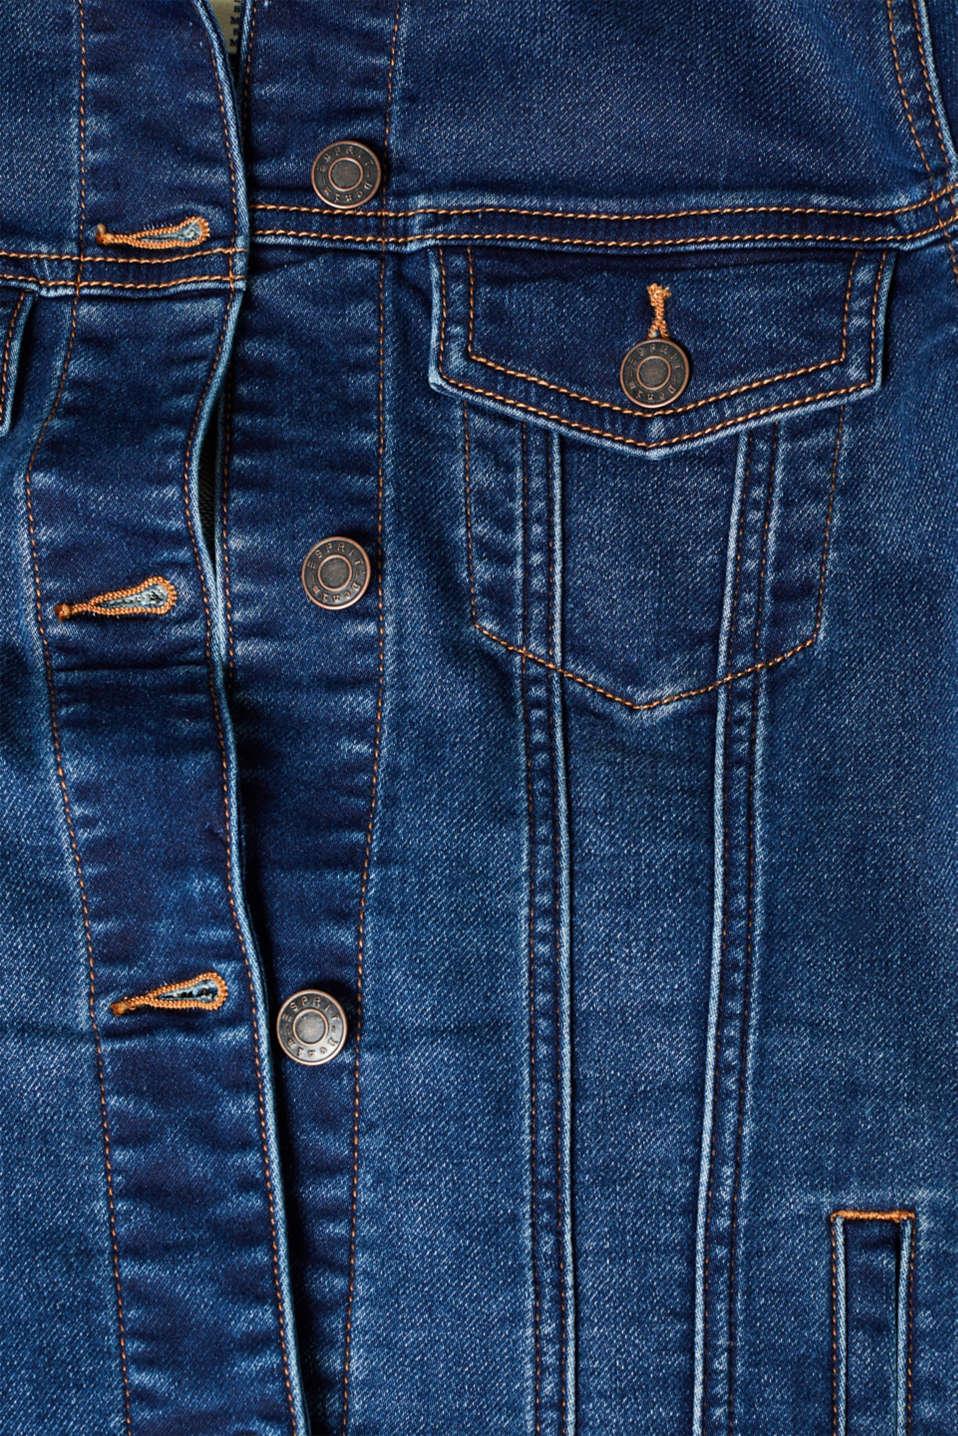 Jackets indoor denim, BLUE DARK WASH, detail image number 4